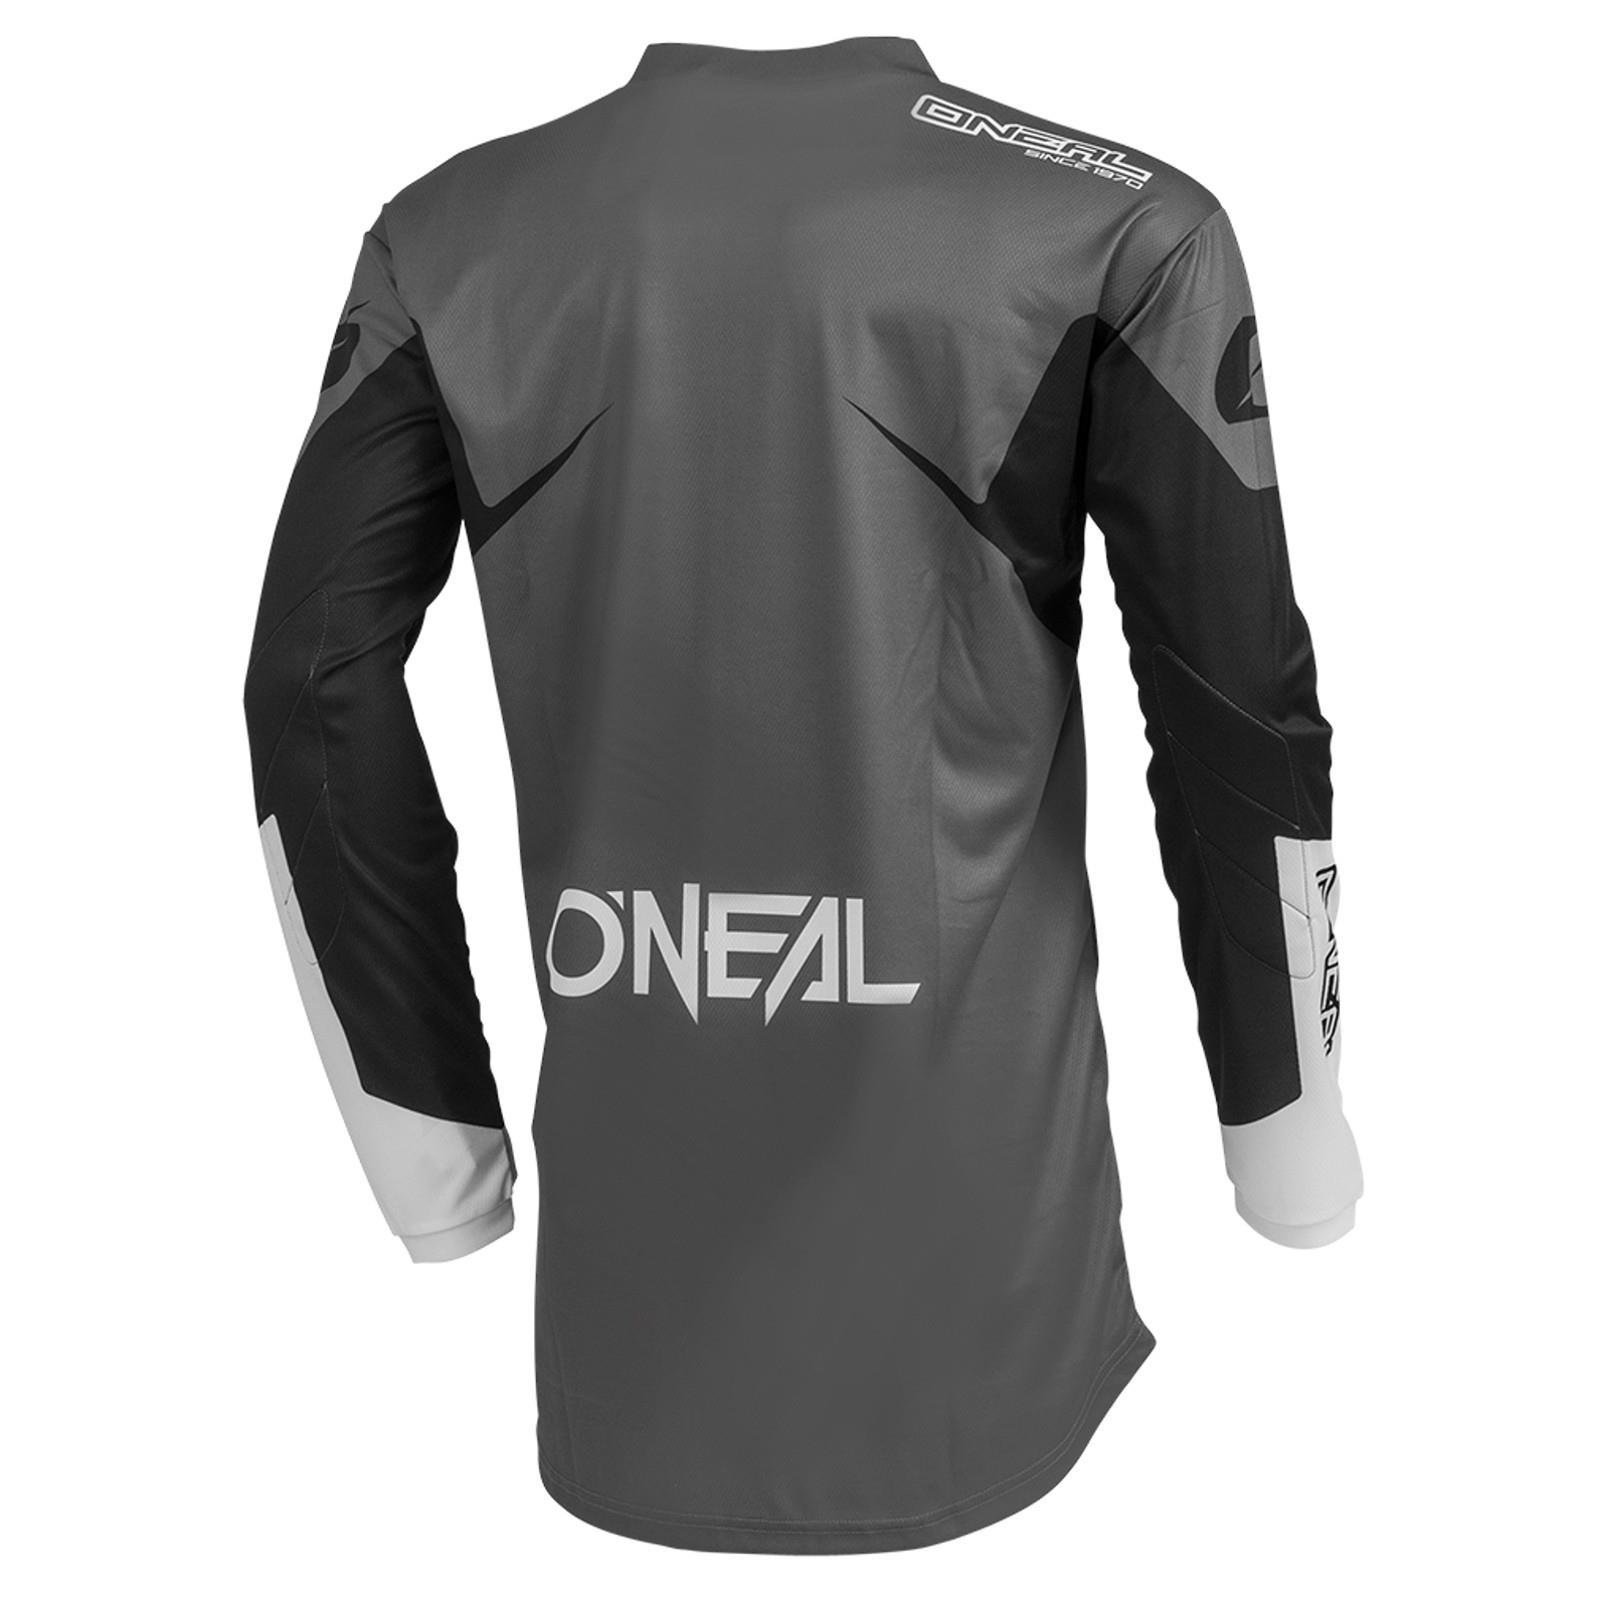 O-039-Neal-Element-Racewear-MOTOCROSS-JERSEY-MX-ENDURO-CROSS-MAGLIA-MOUNTAIN-BIKE miniatura 13